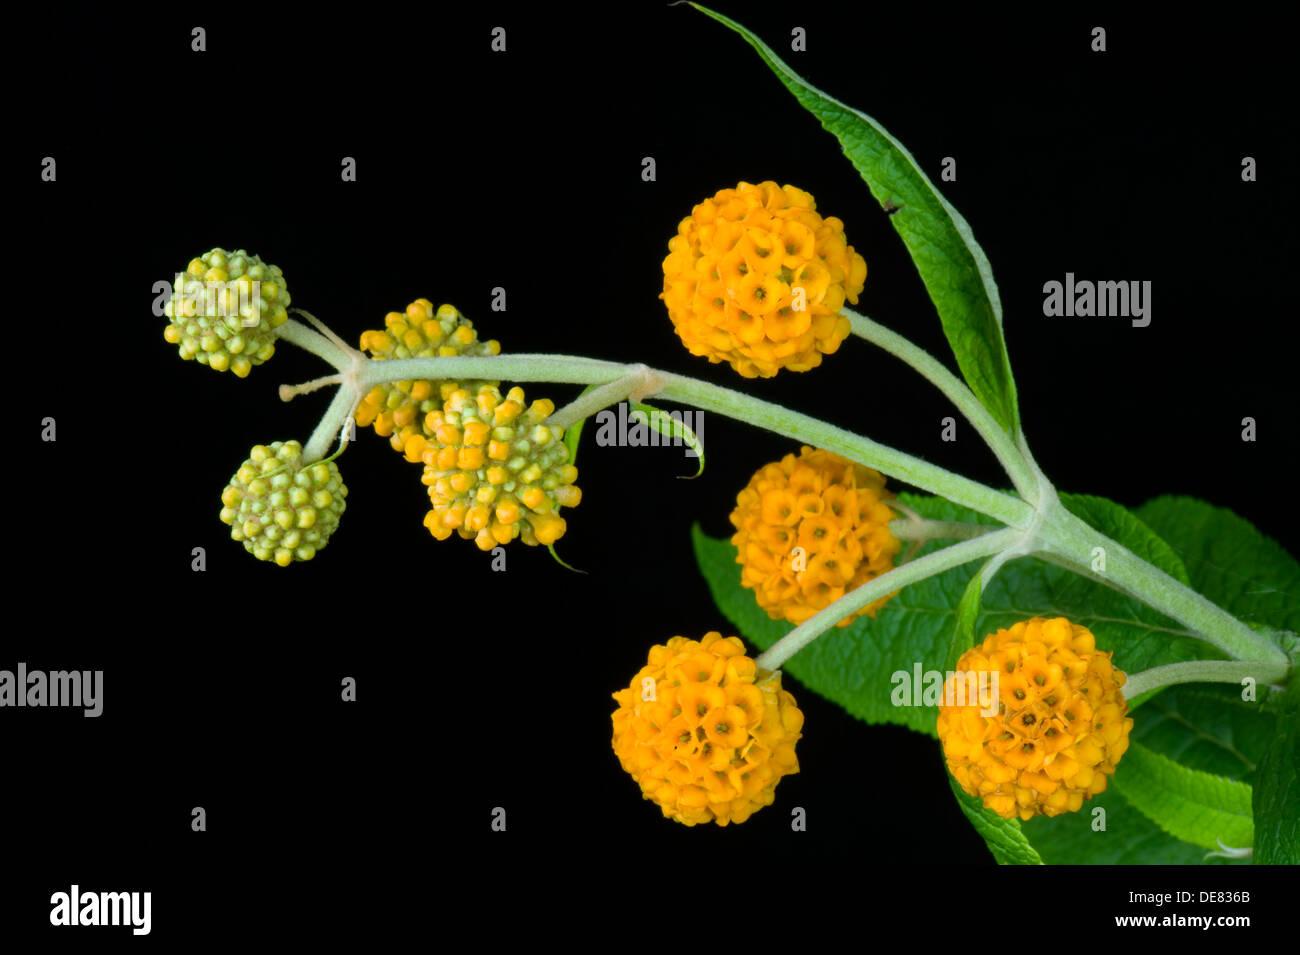 Sfera arancione, buddleja Buddleja globosa, grande arbusto a fioritura Immagini Stock